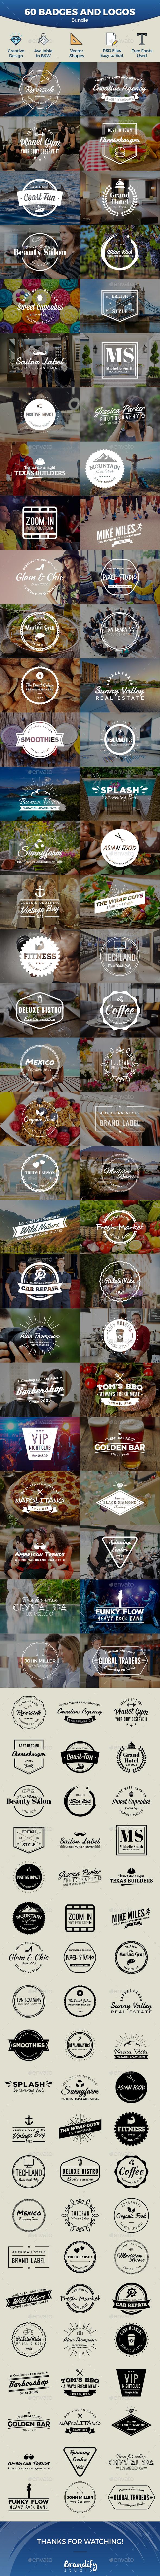 Badges and Logos Bundle - Badges & Stickers Web Elements